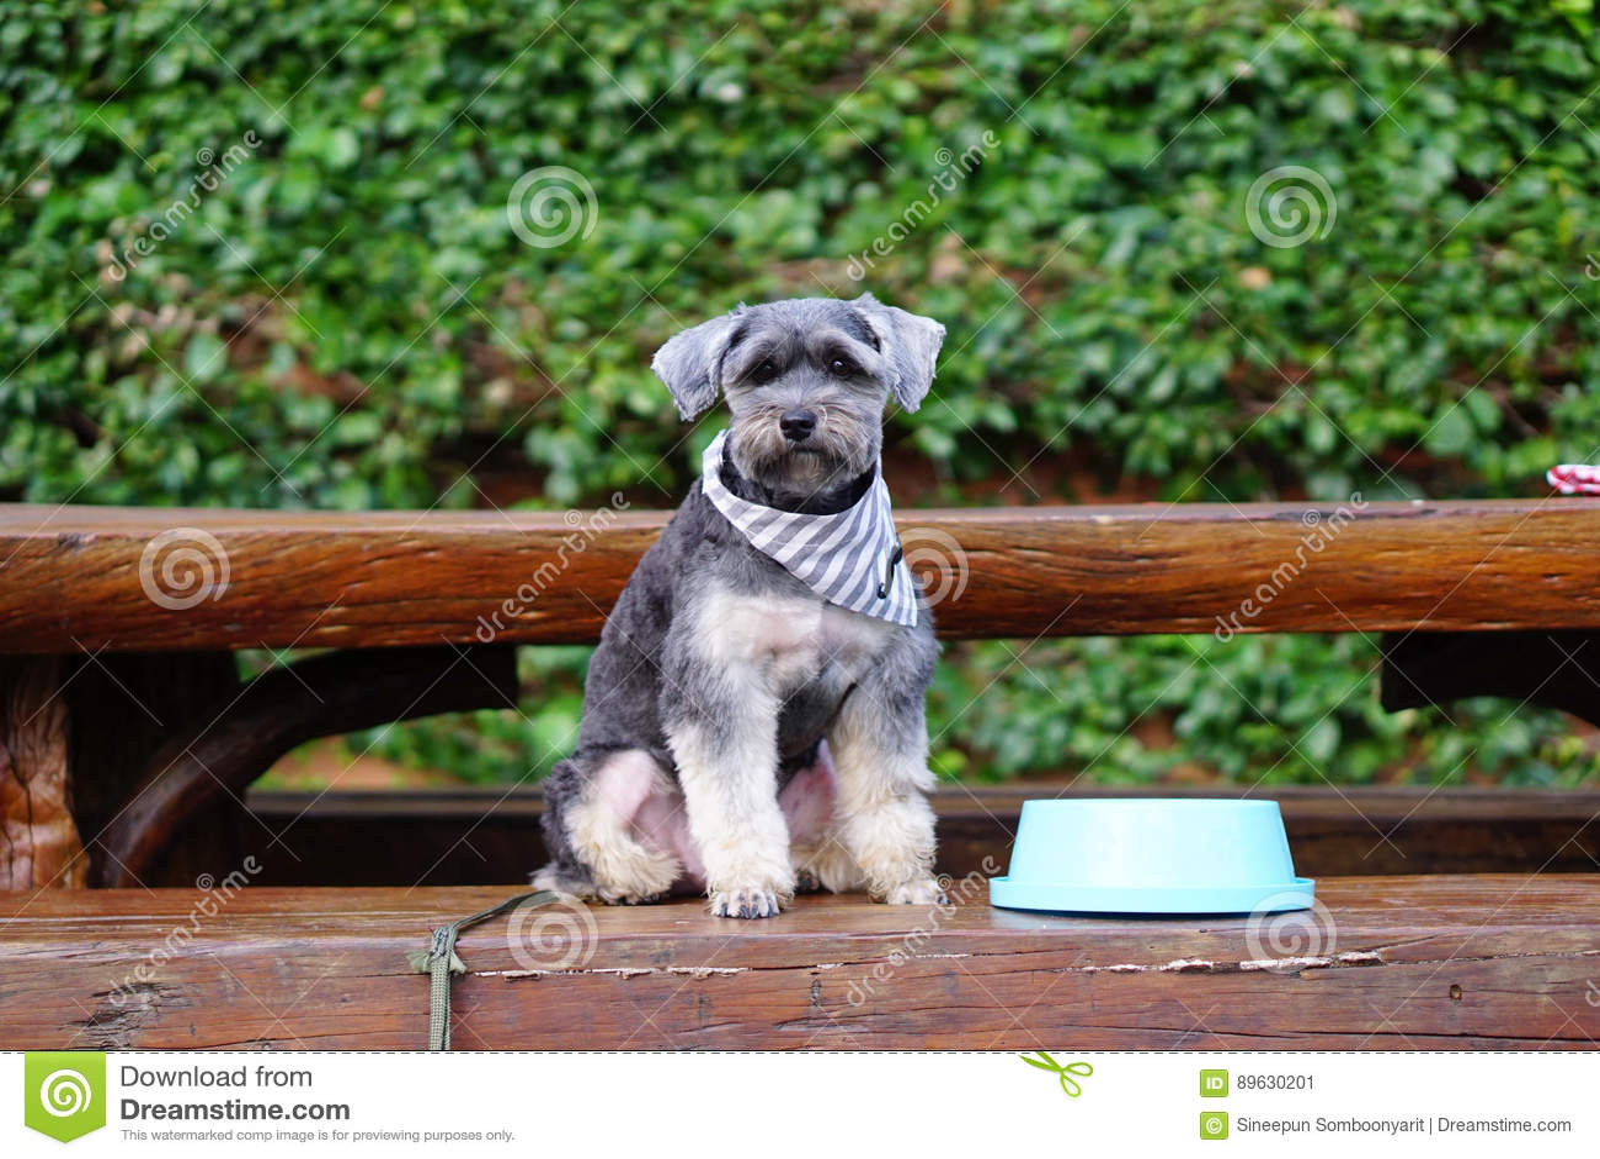 Awe Inspiring Small Black Dog Sitting On The Bench With Blue Bowl Stock Frankydiablos Diy Chair Ideas Frankydiabloscom